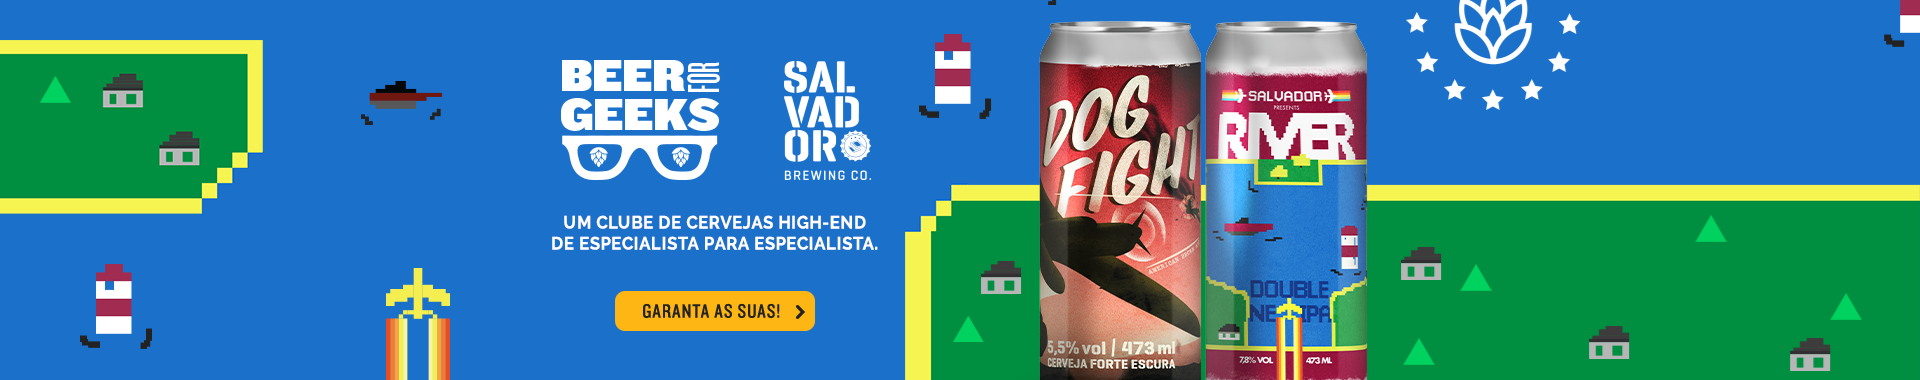 Beer For Geeks Agosto - Banner Home Desktop